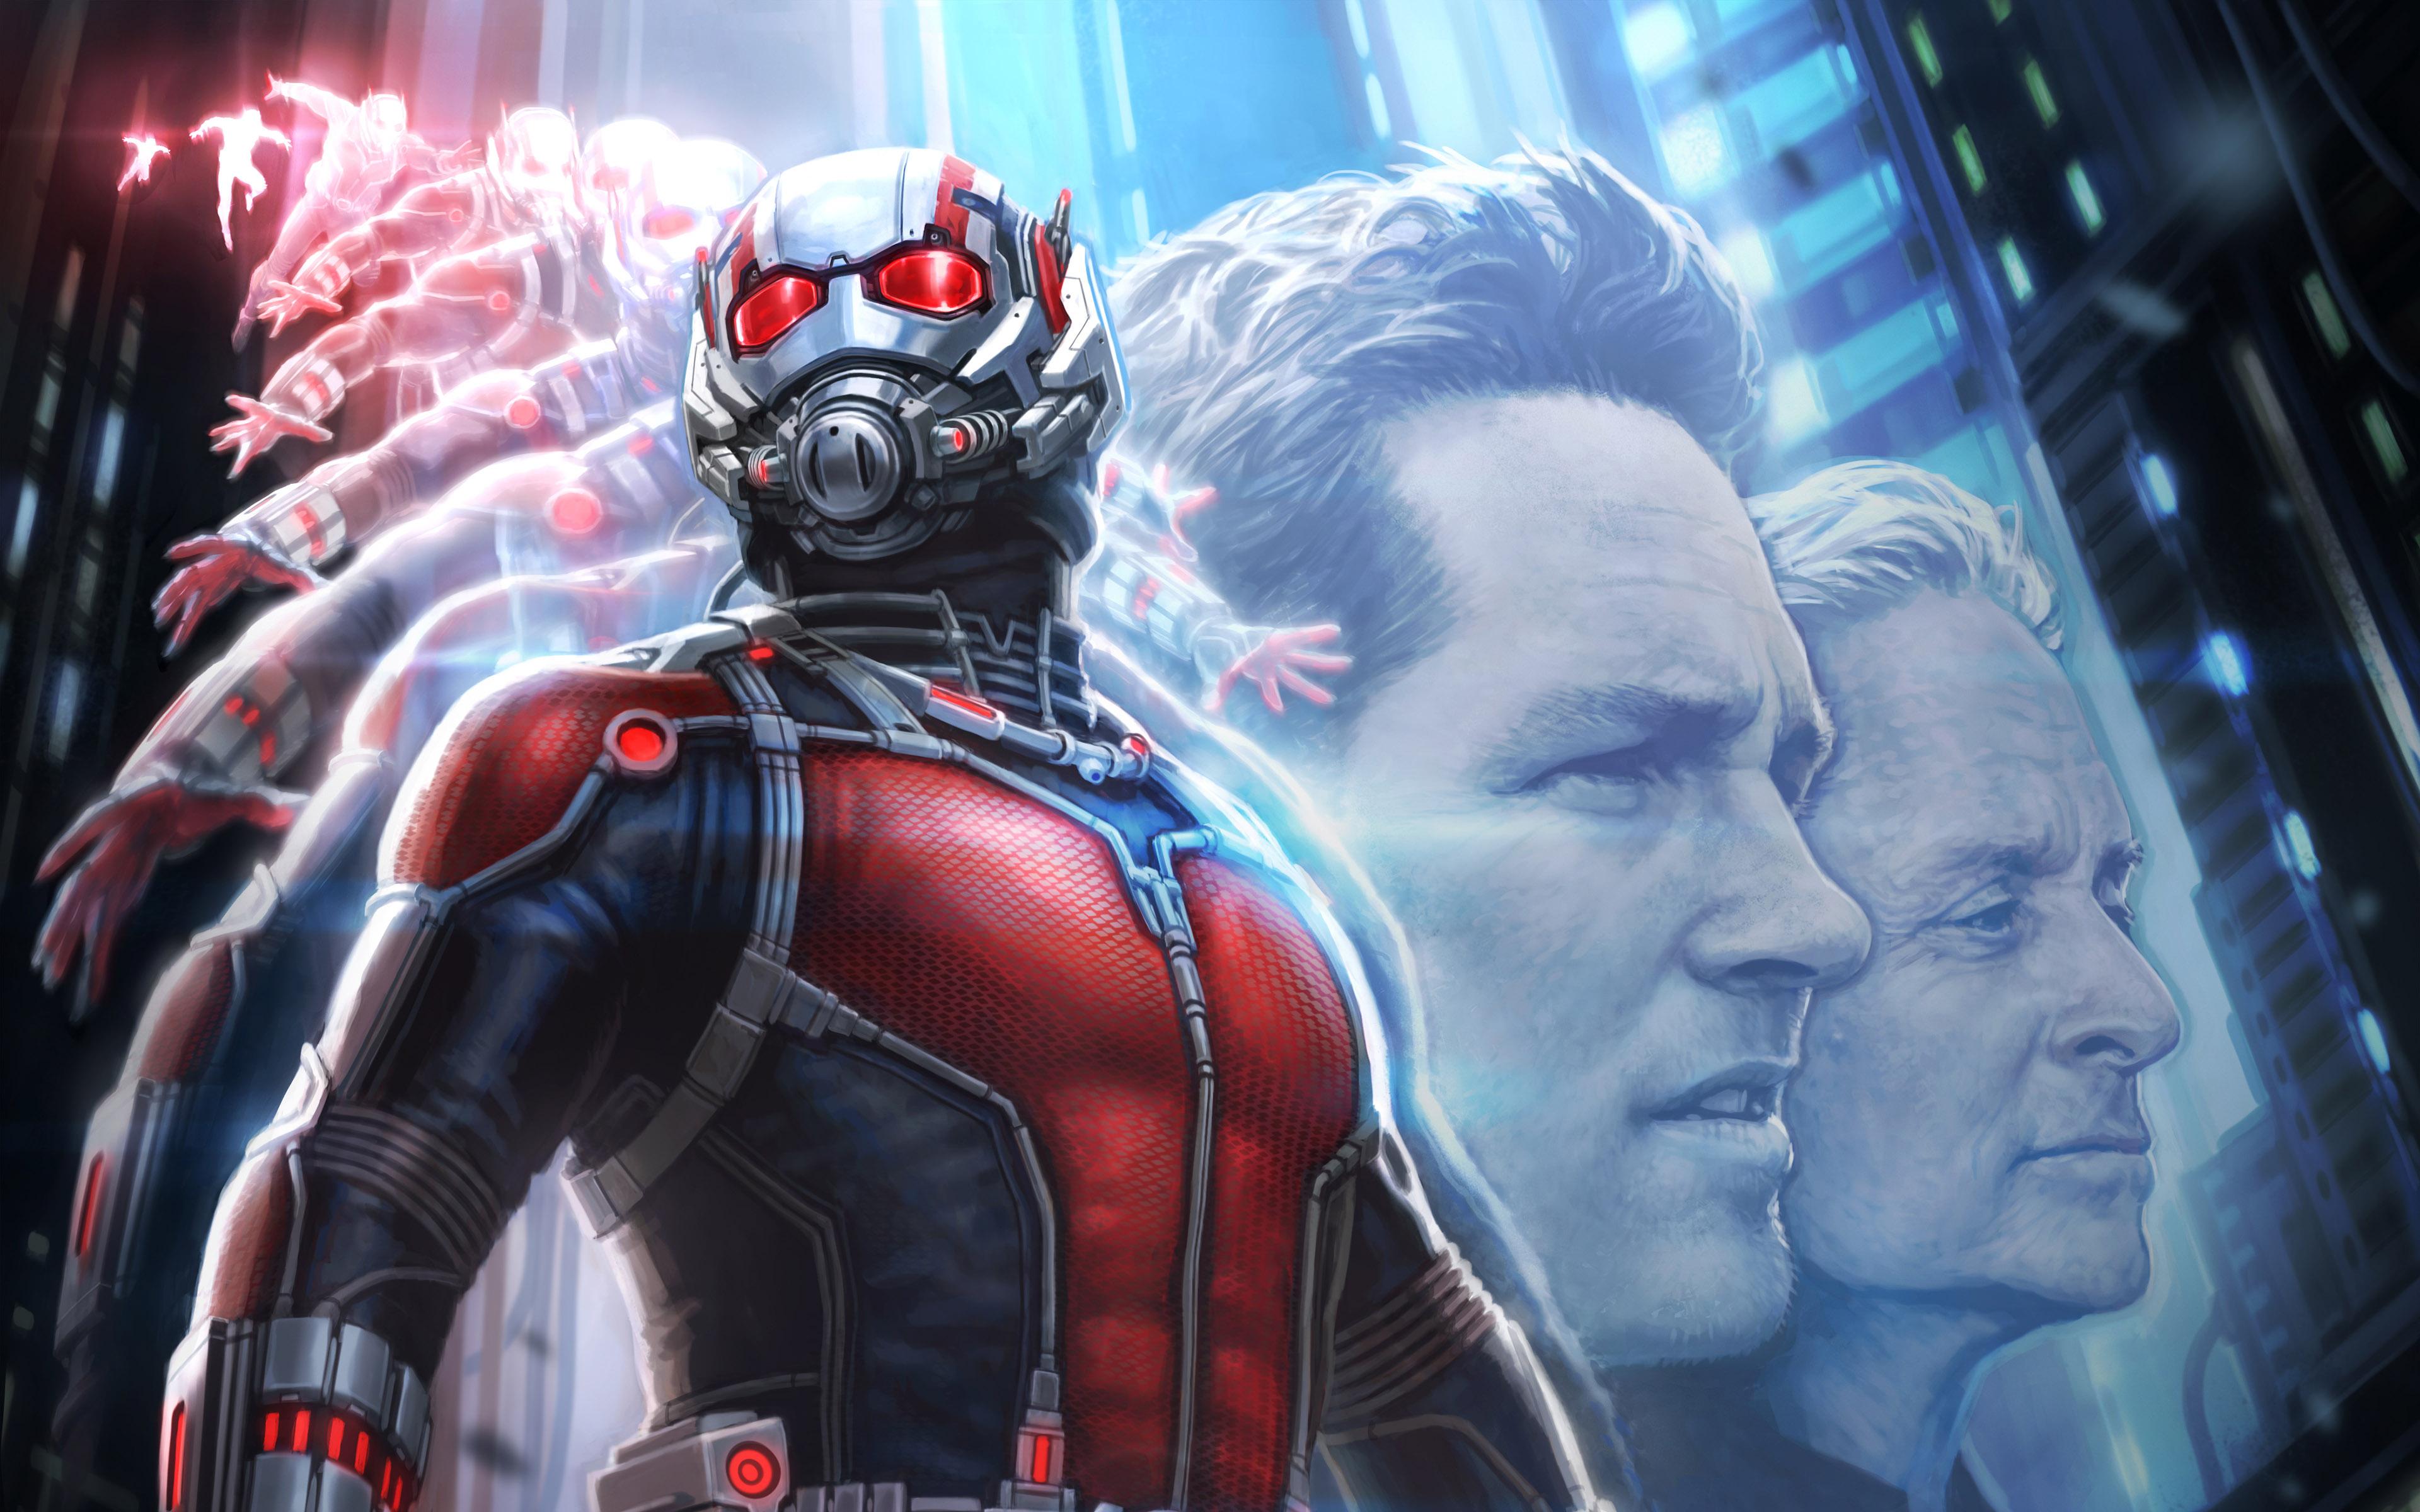 http://www.geeksandcom.com/wp-content/uploads/2015/01/Ant-Man.jpeg